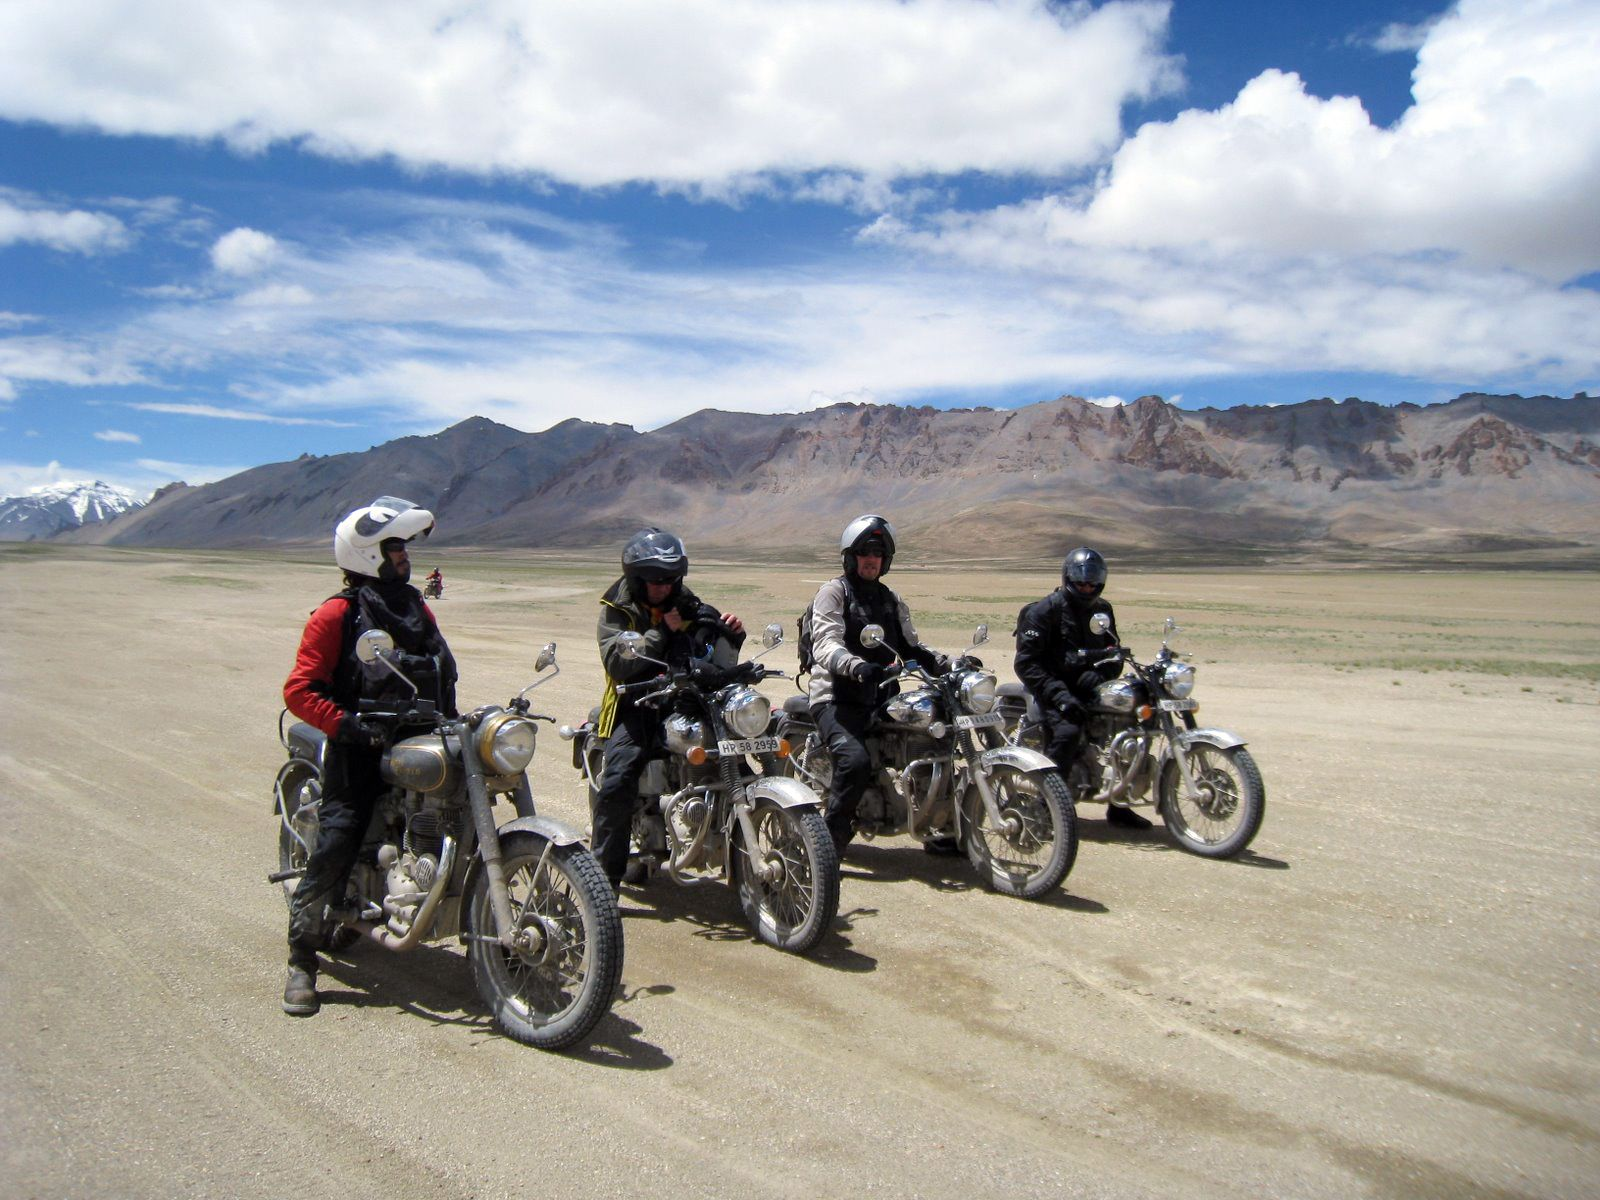 The Best Adventure Ladakh Motor Bike Trip 2020 On Royal Enfield